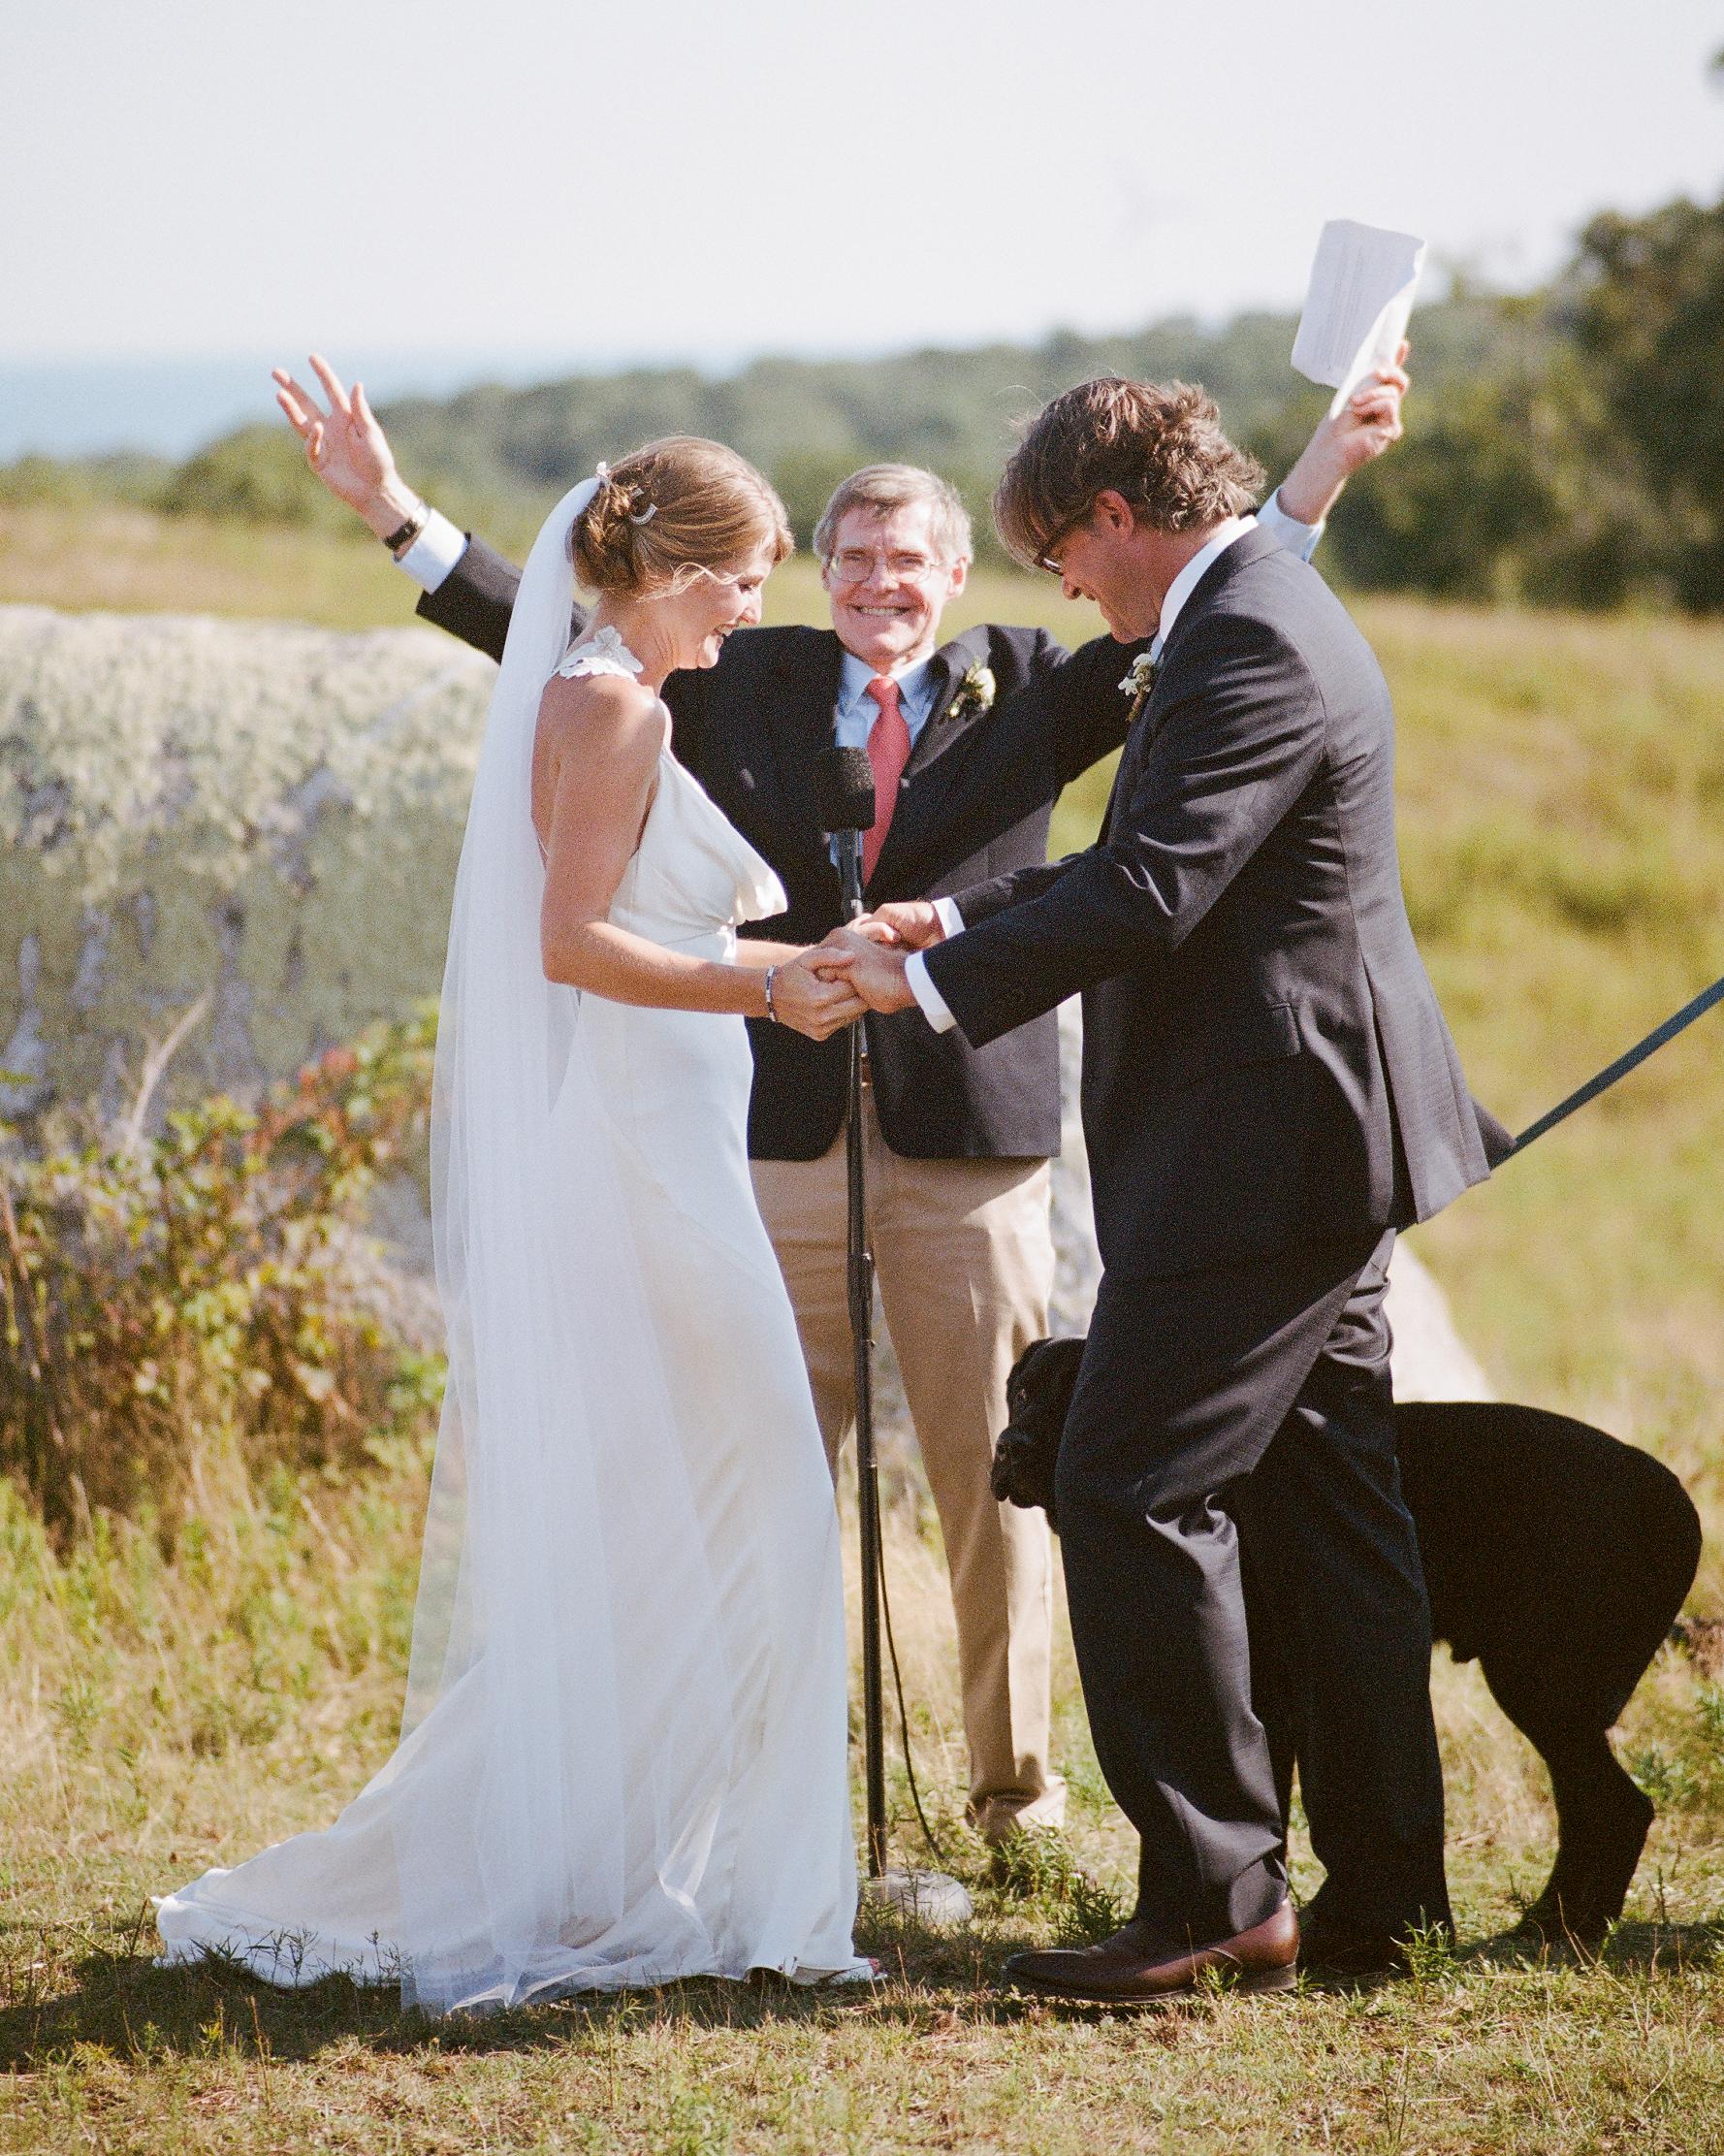 jocelyn-graham-wedding-ceremony-0807-s111847-0315.jpg